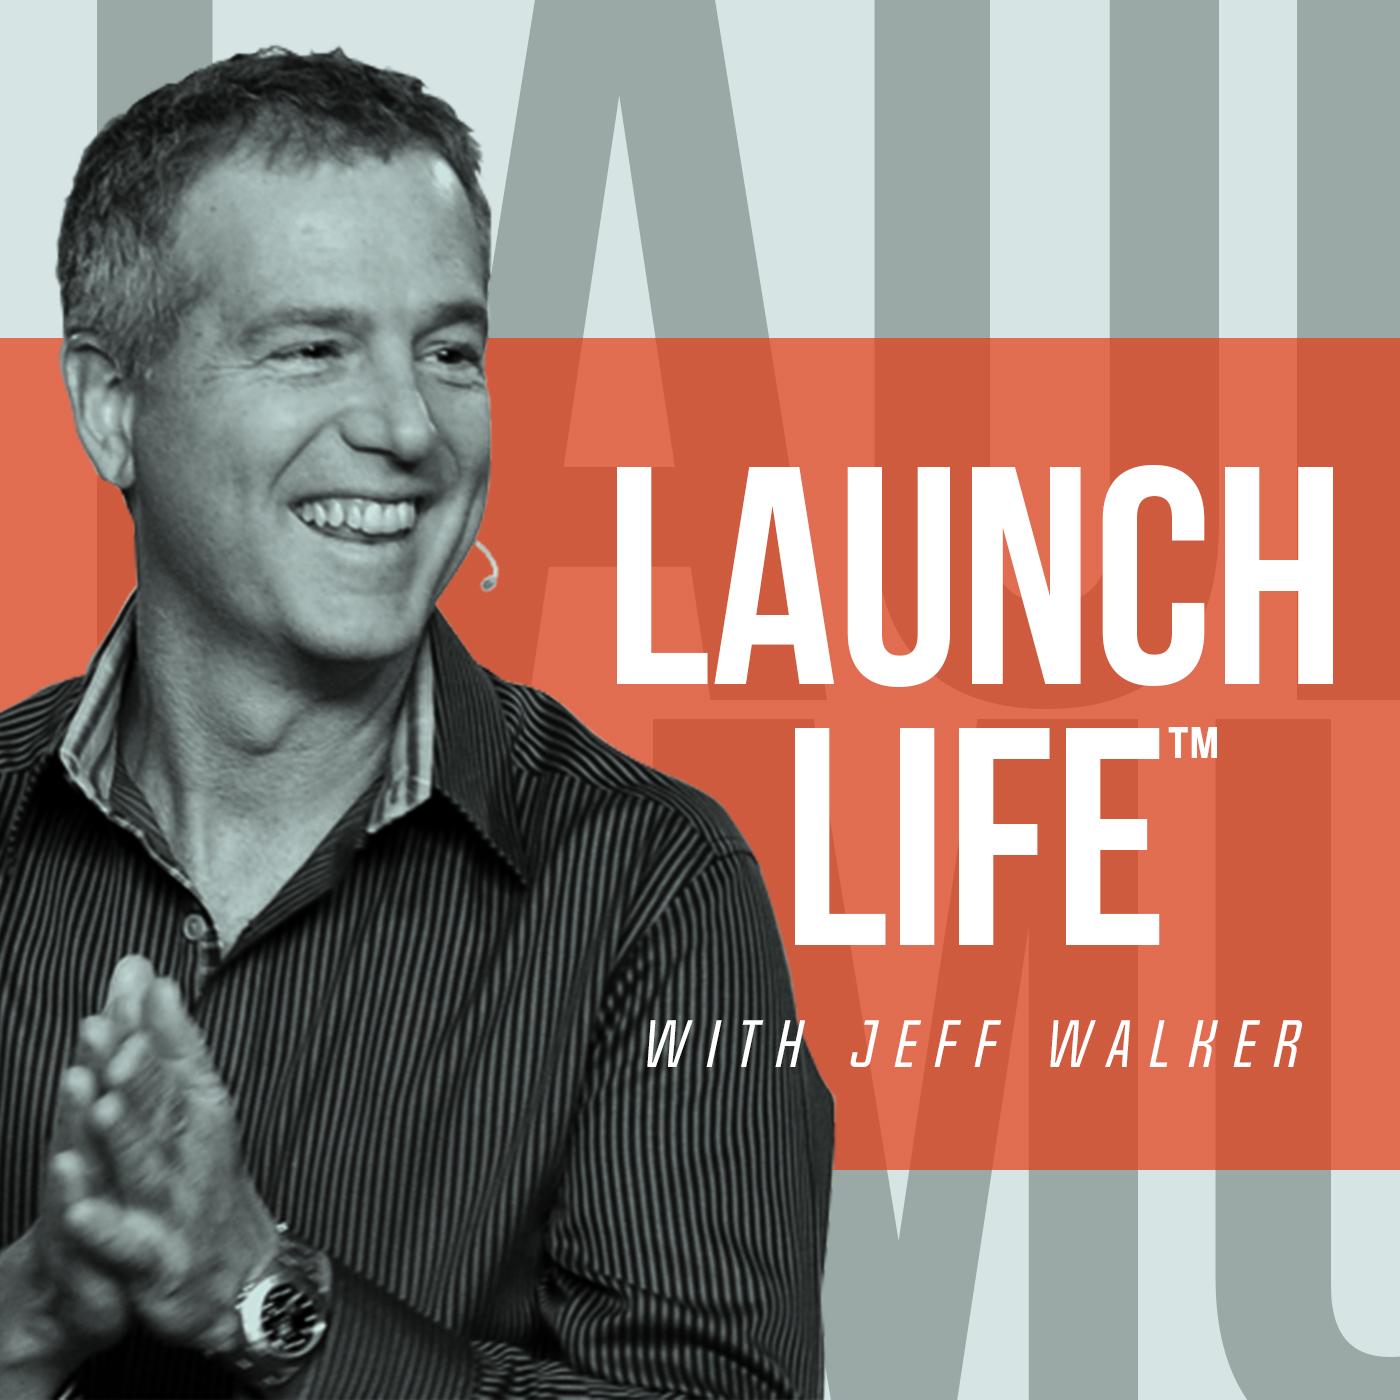 Launch Life